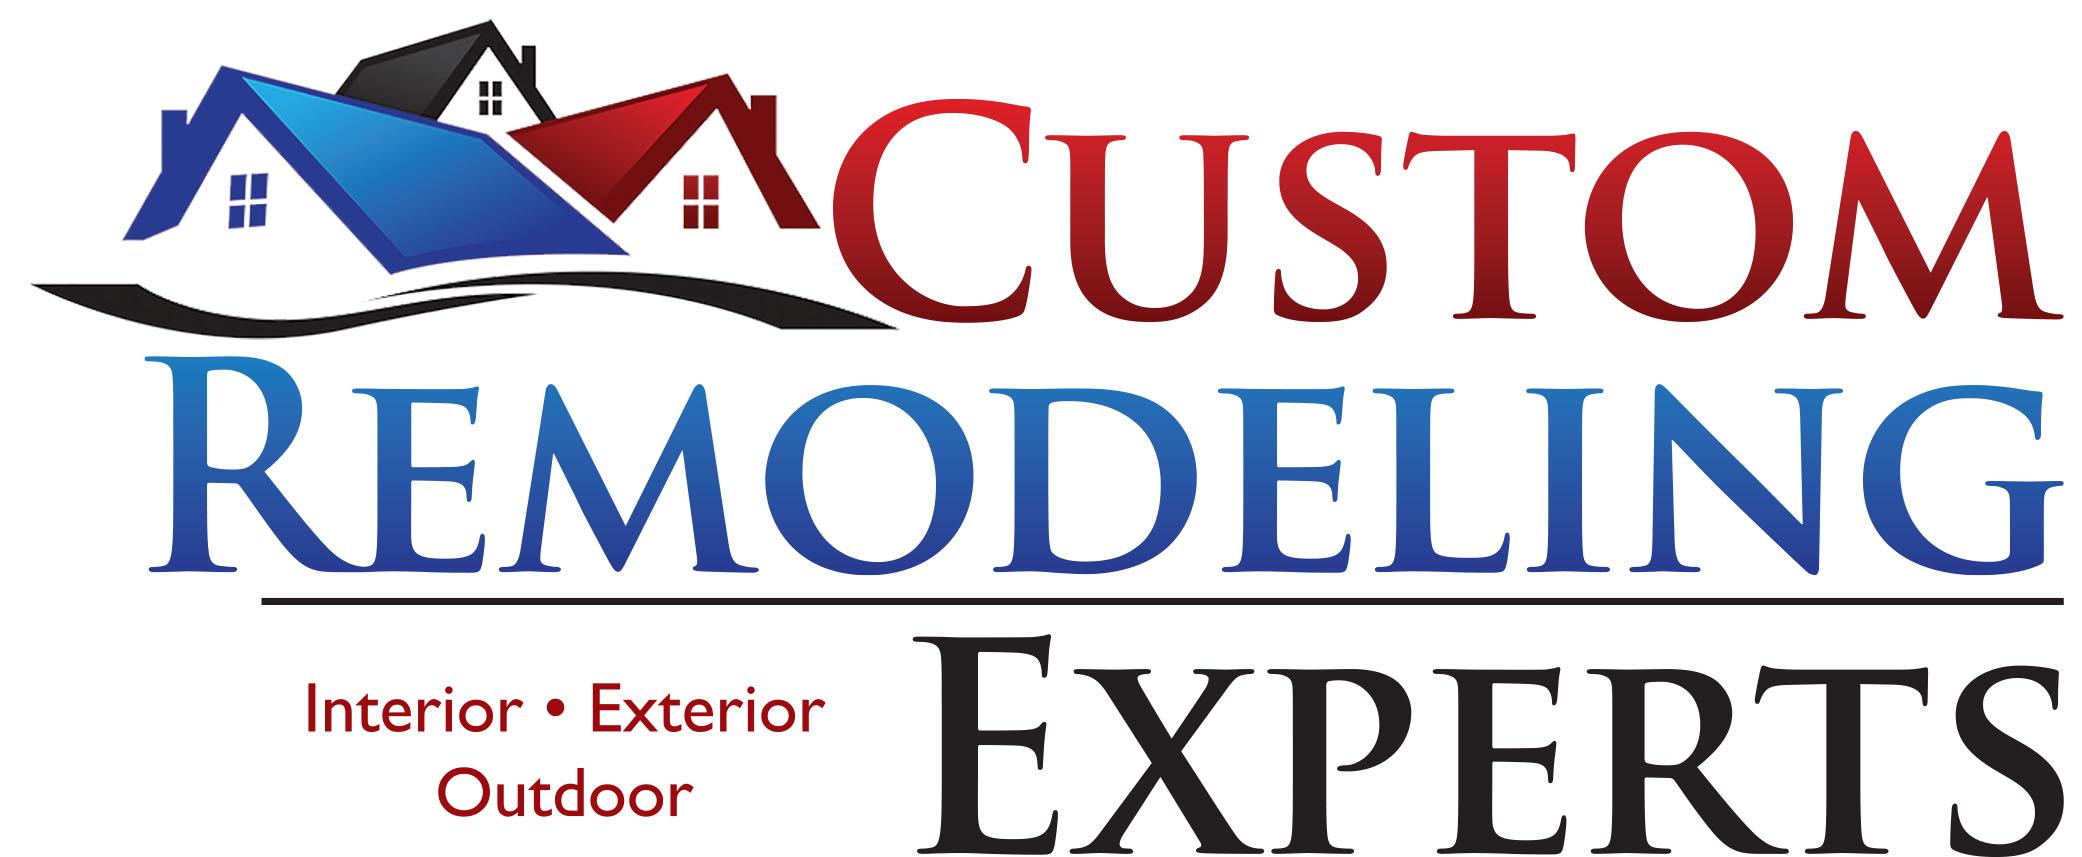 Custom Remodeling Experts